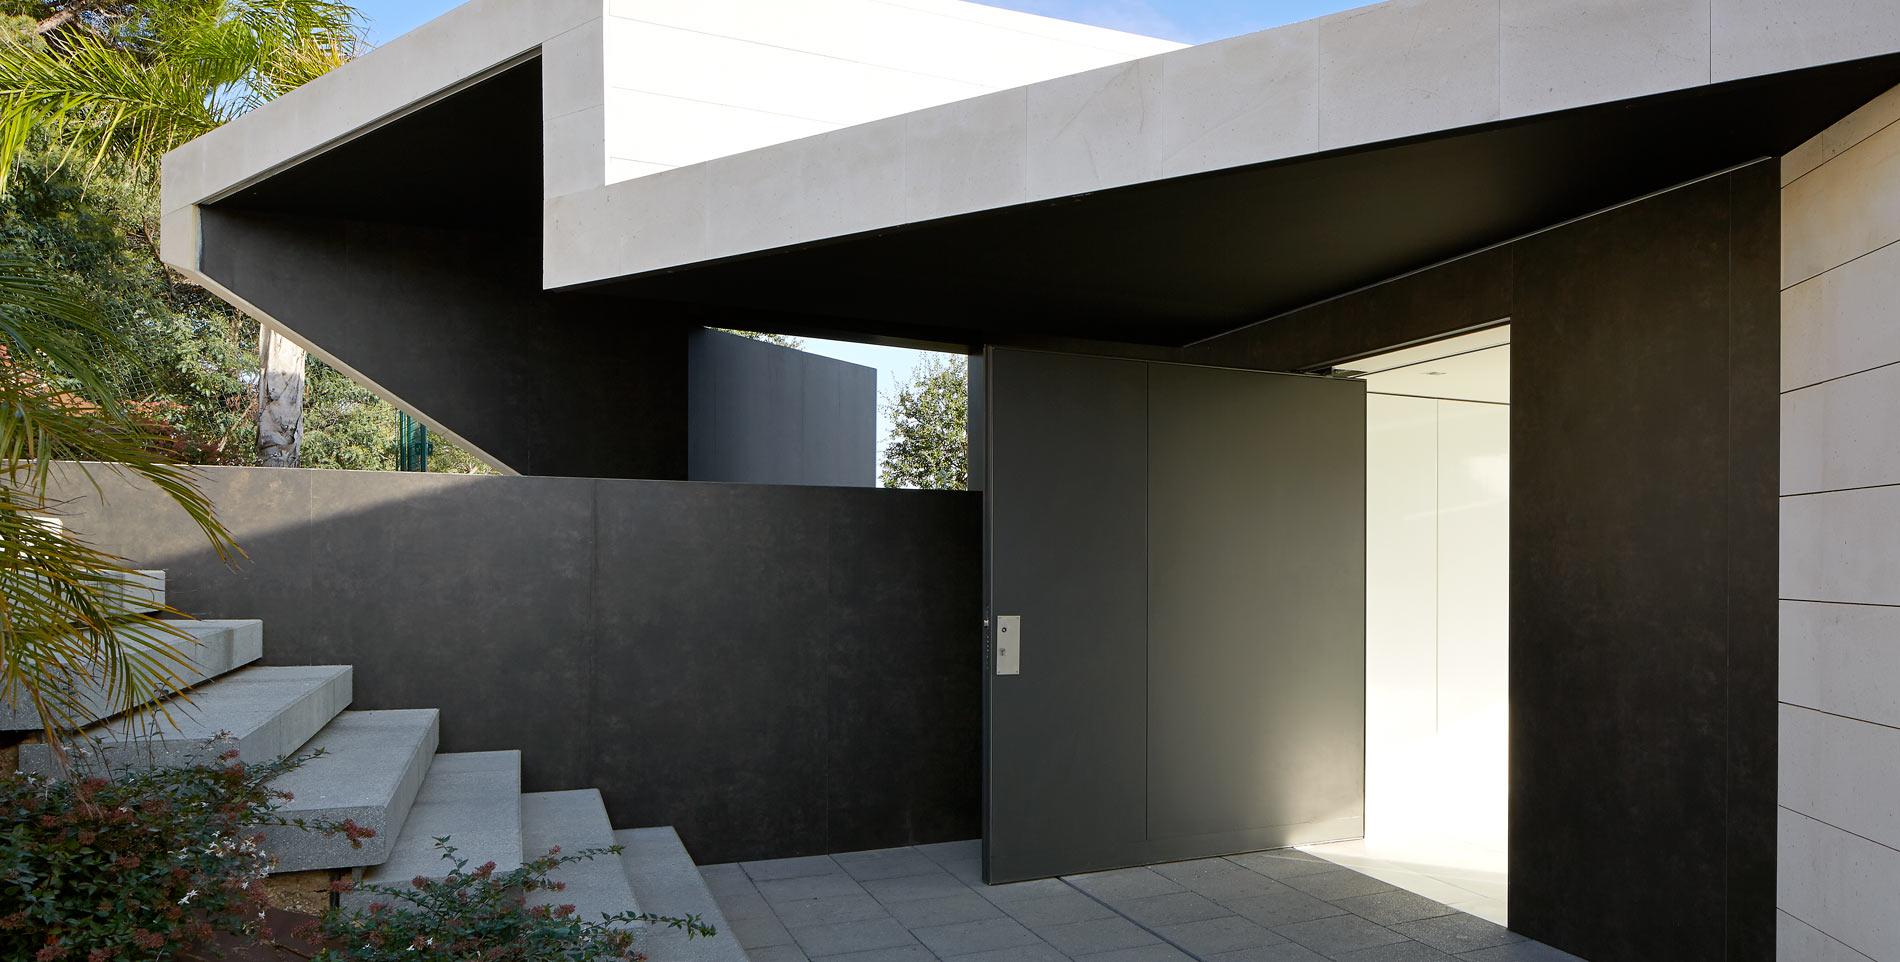 ceramica para fachadas exteriores trendy with ceramica